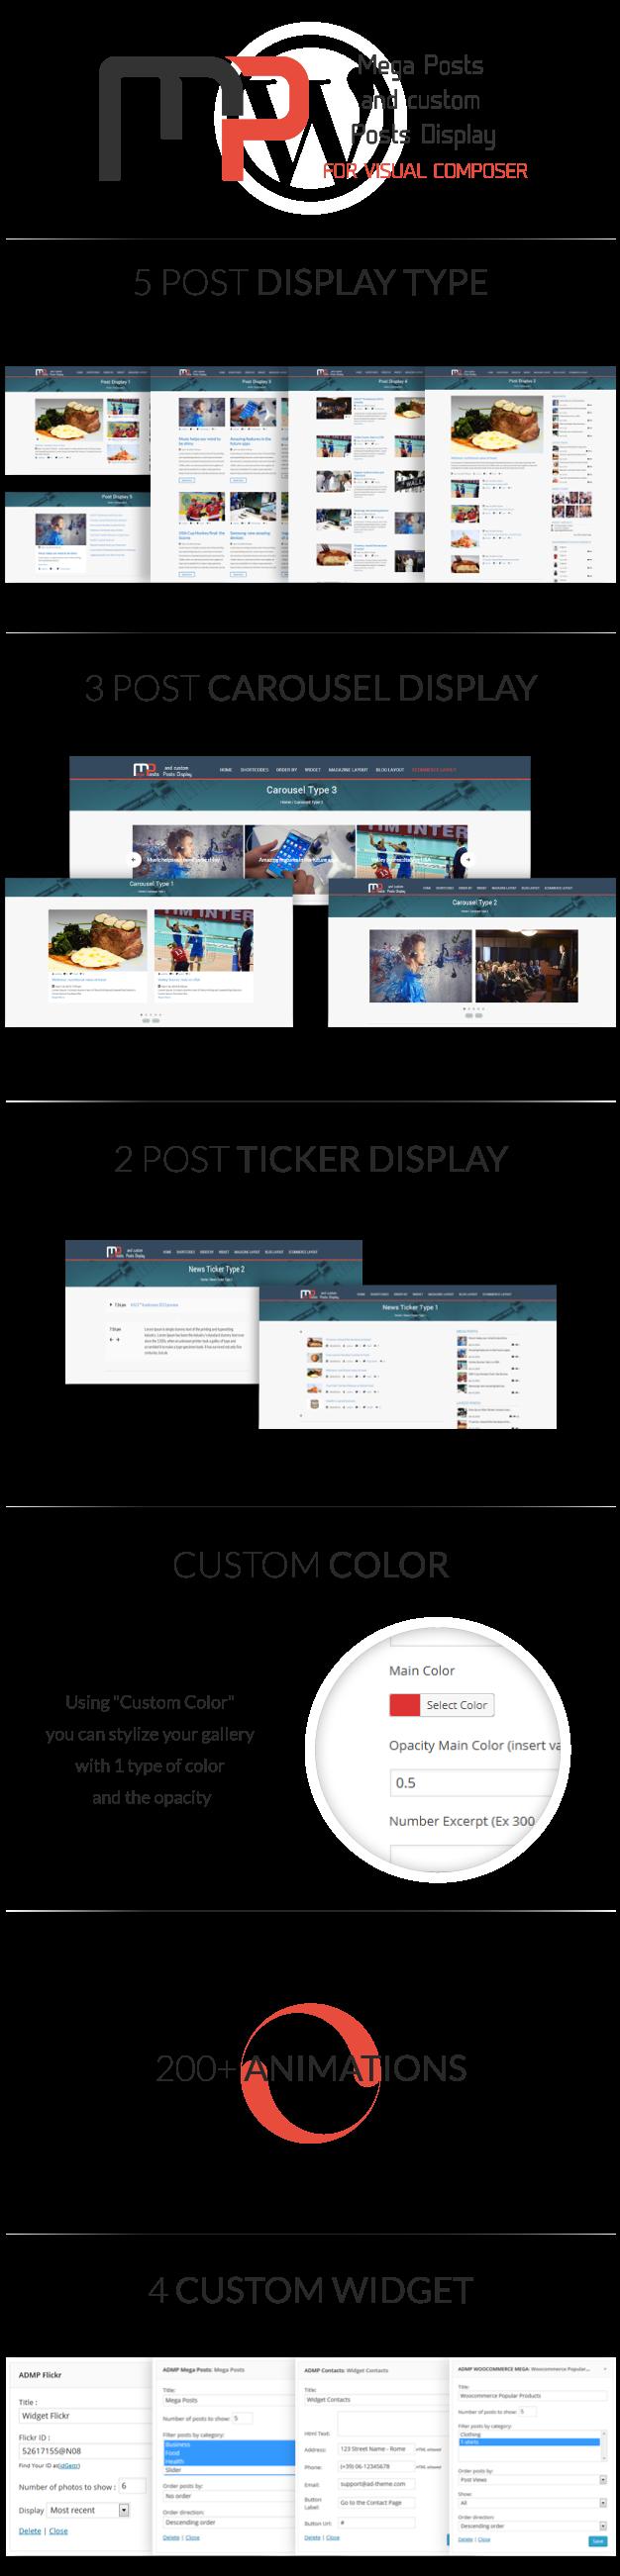 Mega Posts Display for Visual Composer - 1